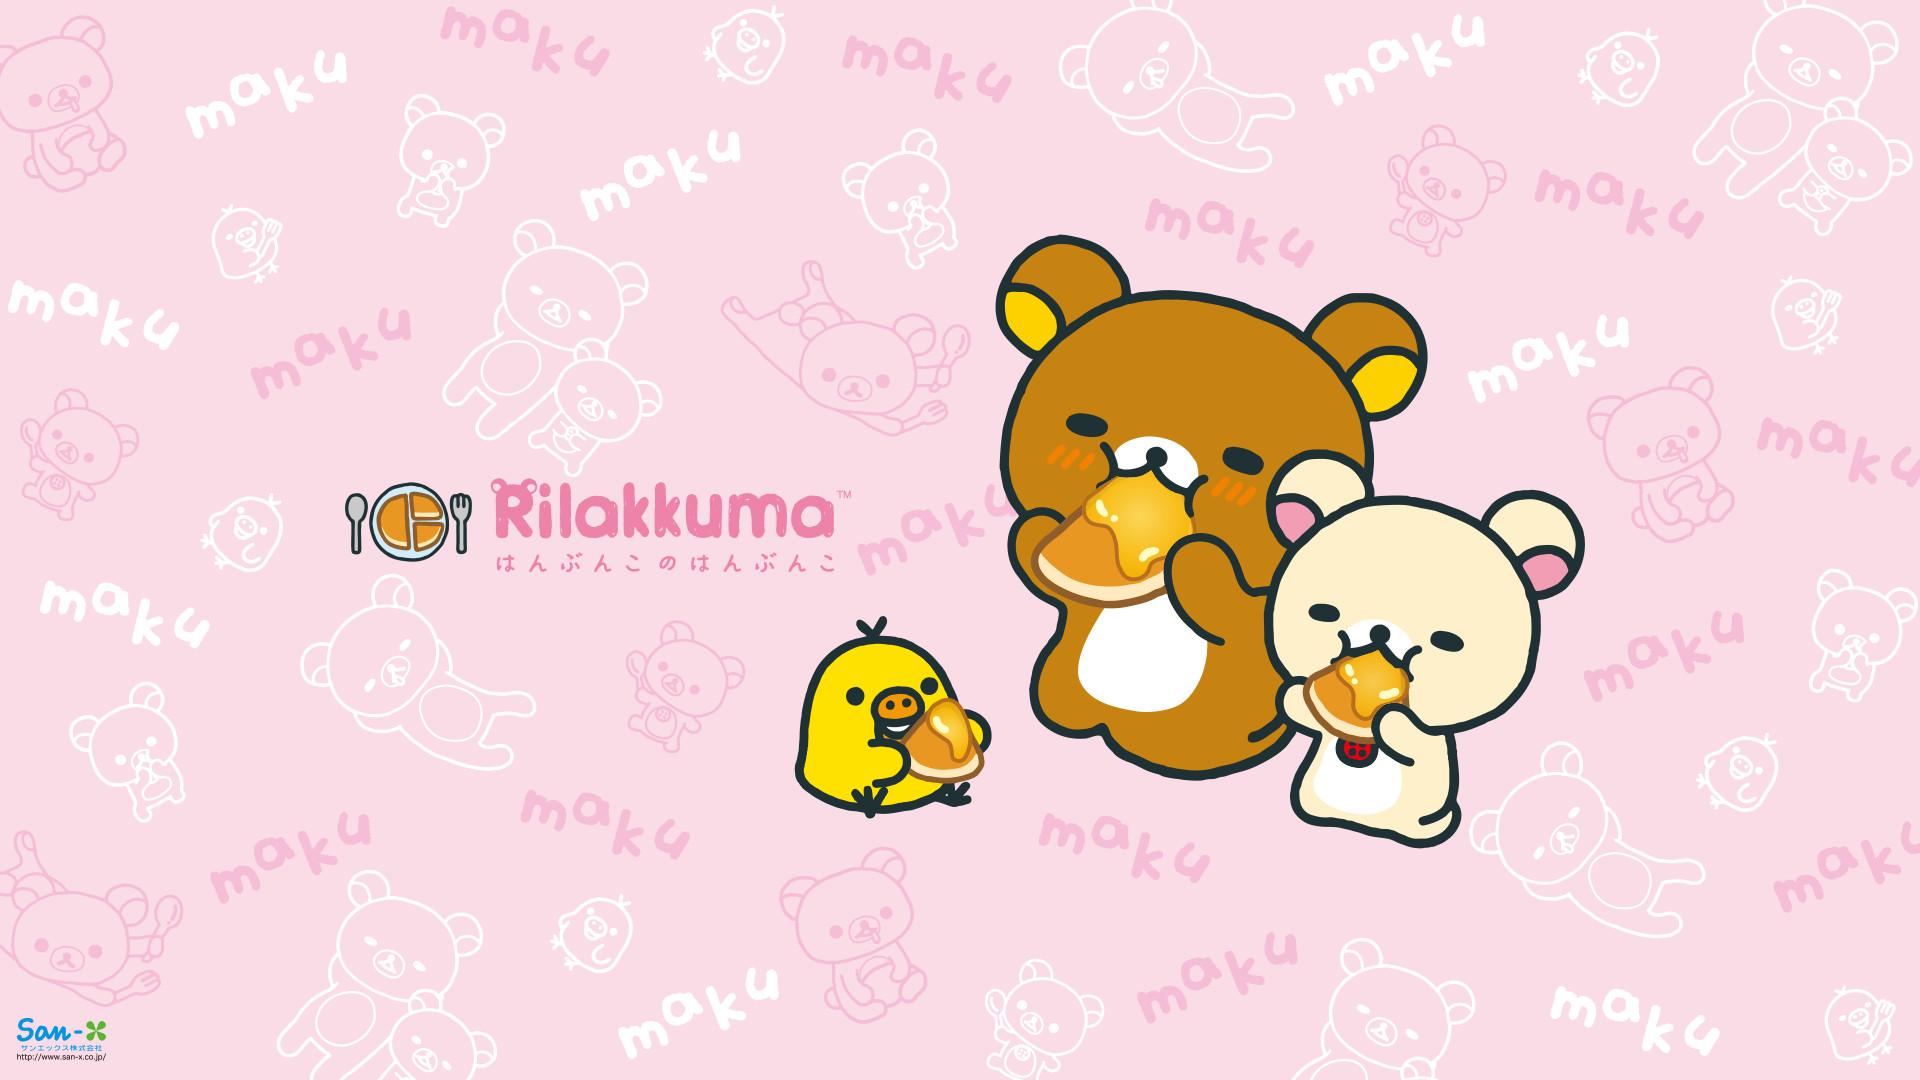 80_1080_1920.png 1,920×1,080 pixels | BG/Wallpaper/Pattern | Pinterest |  Rilakkuma, Rilakkuma wallpaper and Sanrio